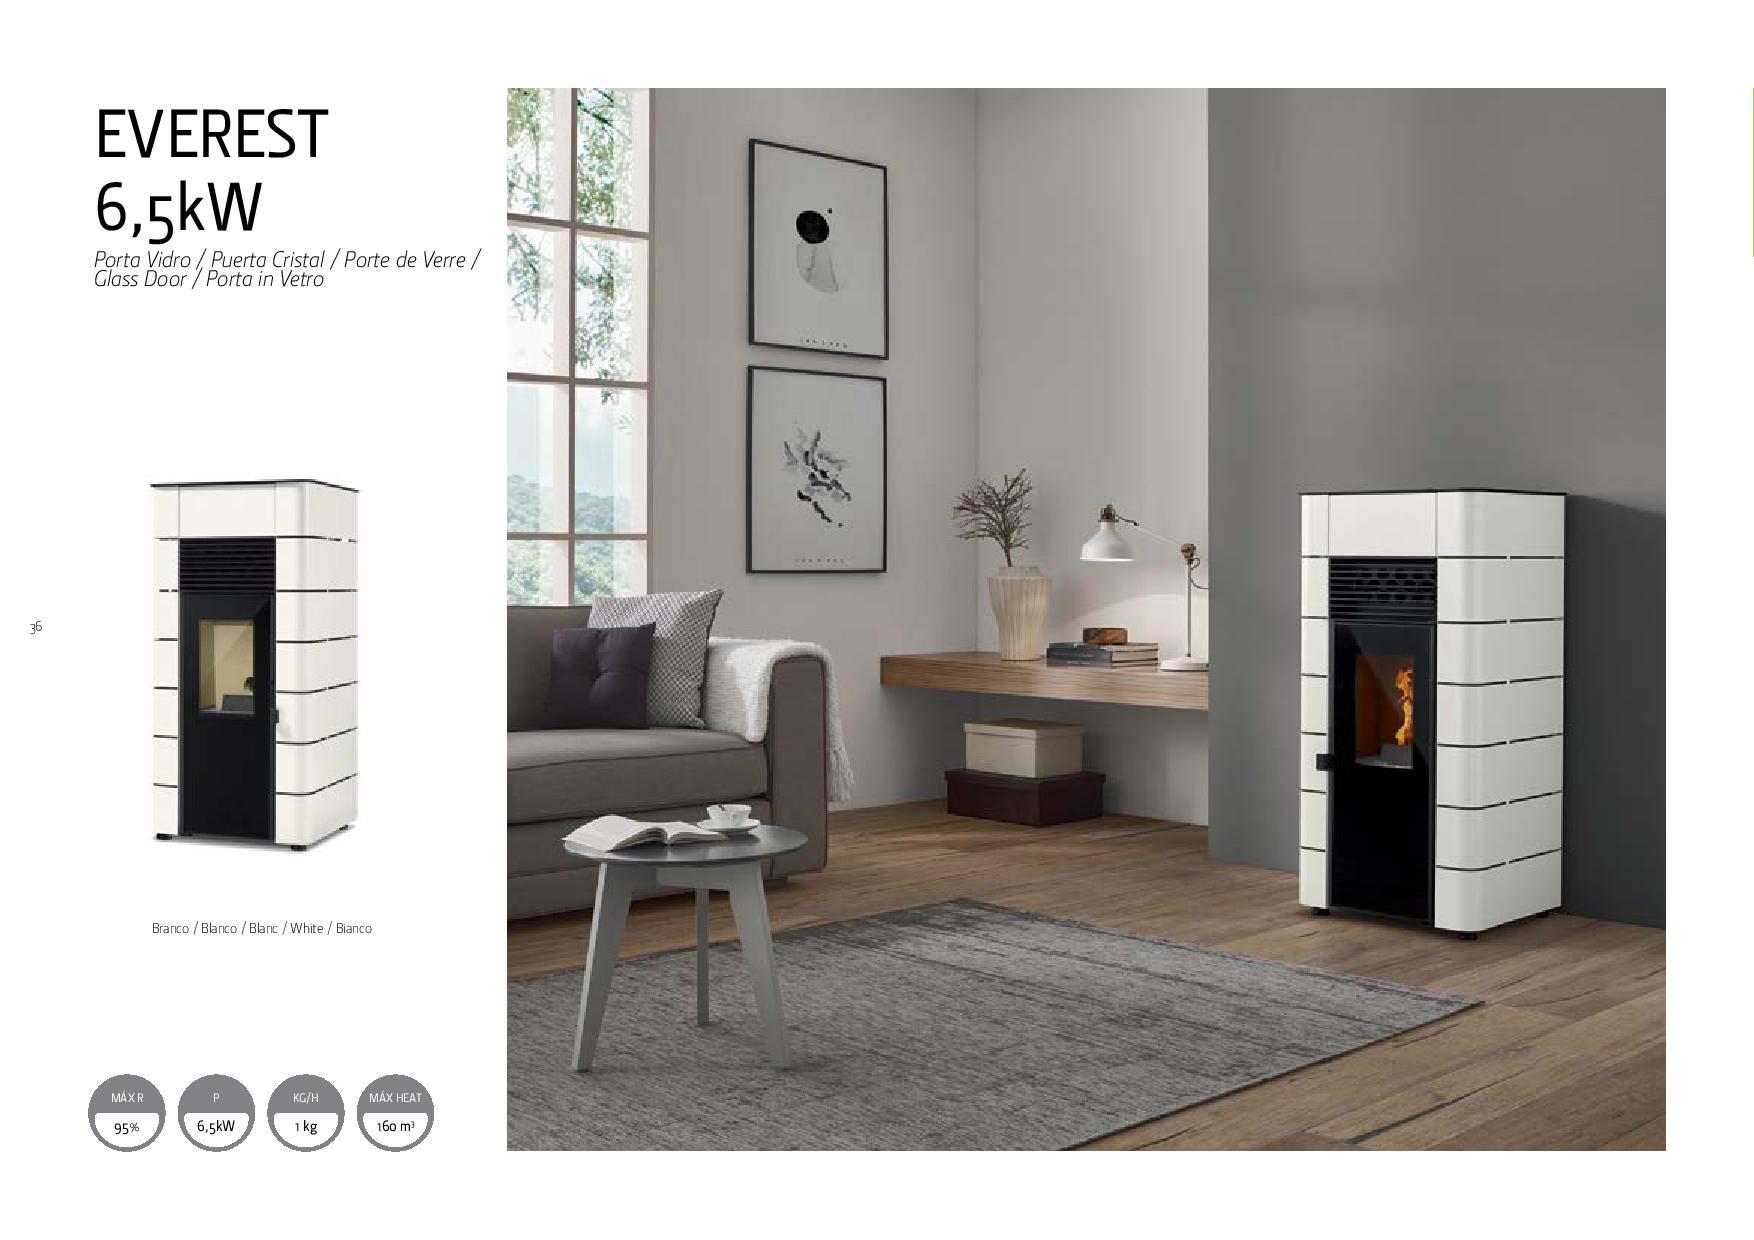 catalogue solzaima 2018 poele design toulouse. Black Bedroom Furniture Sets. Home Design Ideas